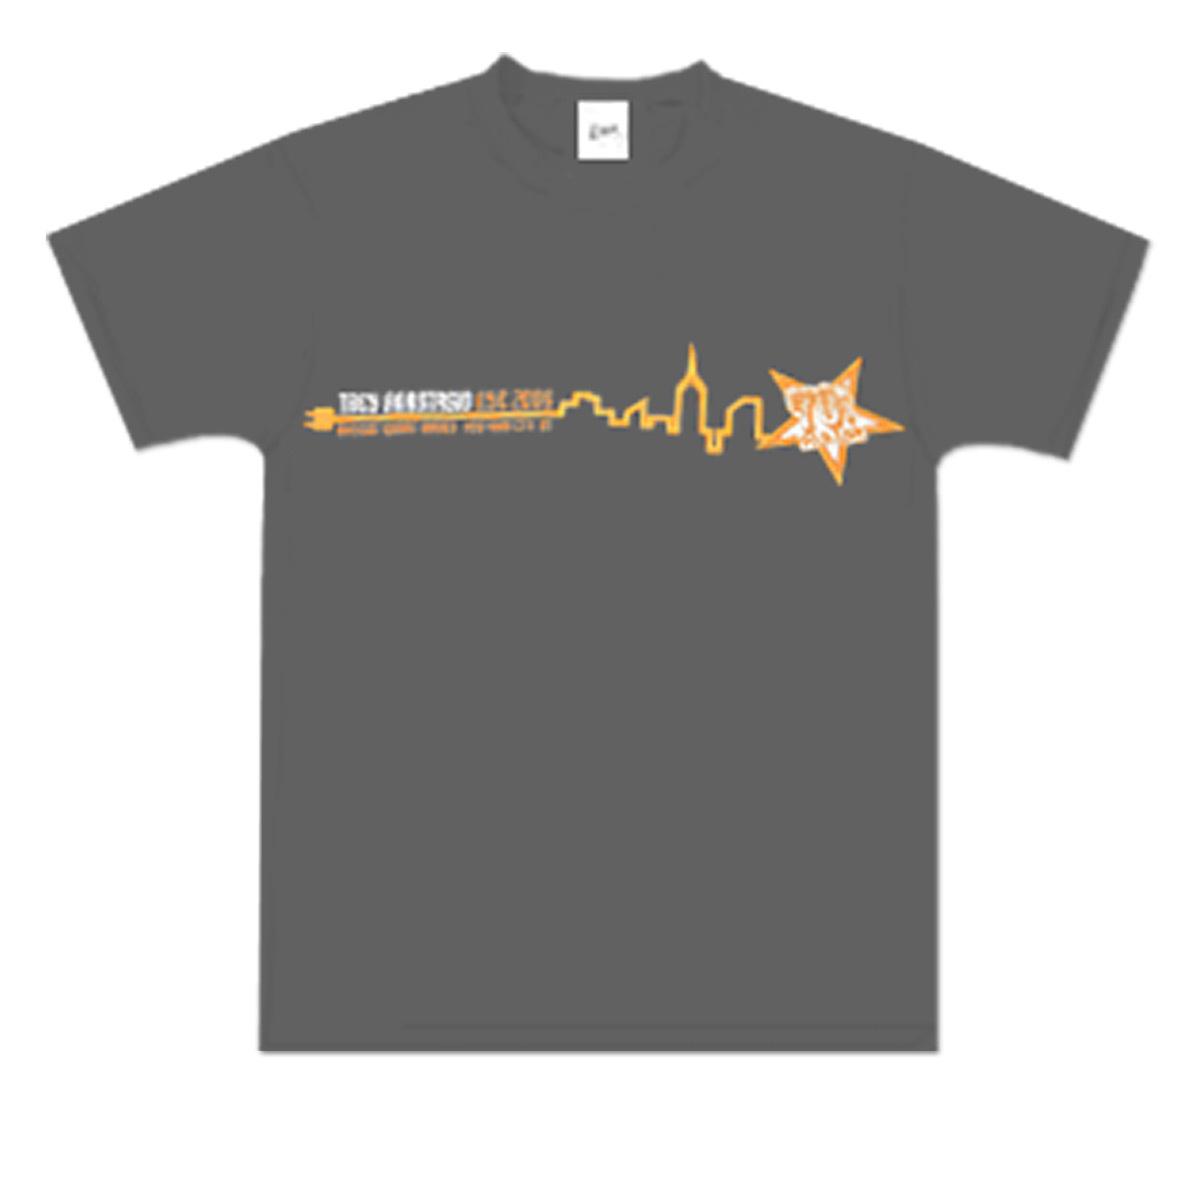 Trey Anastasio 70 Volt Parade MSG NYE '06 Event T-Shirt